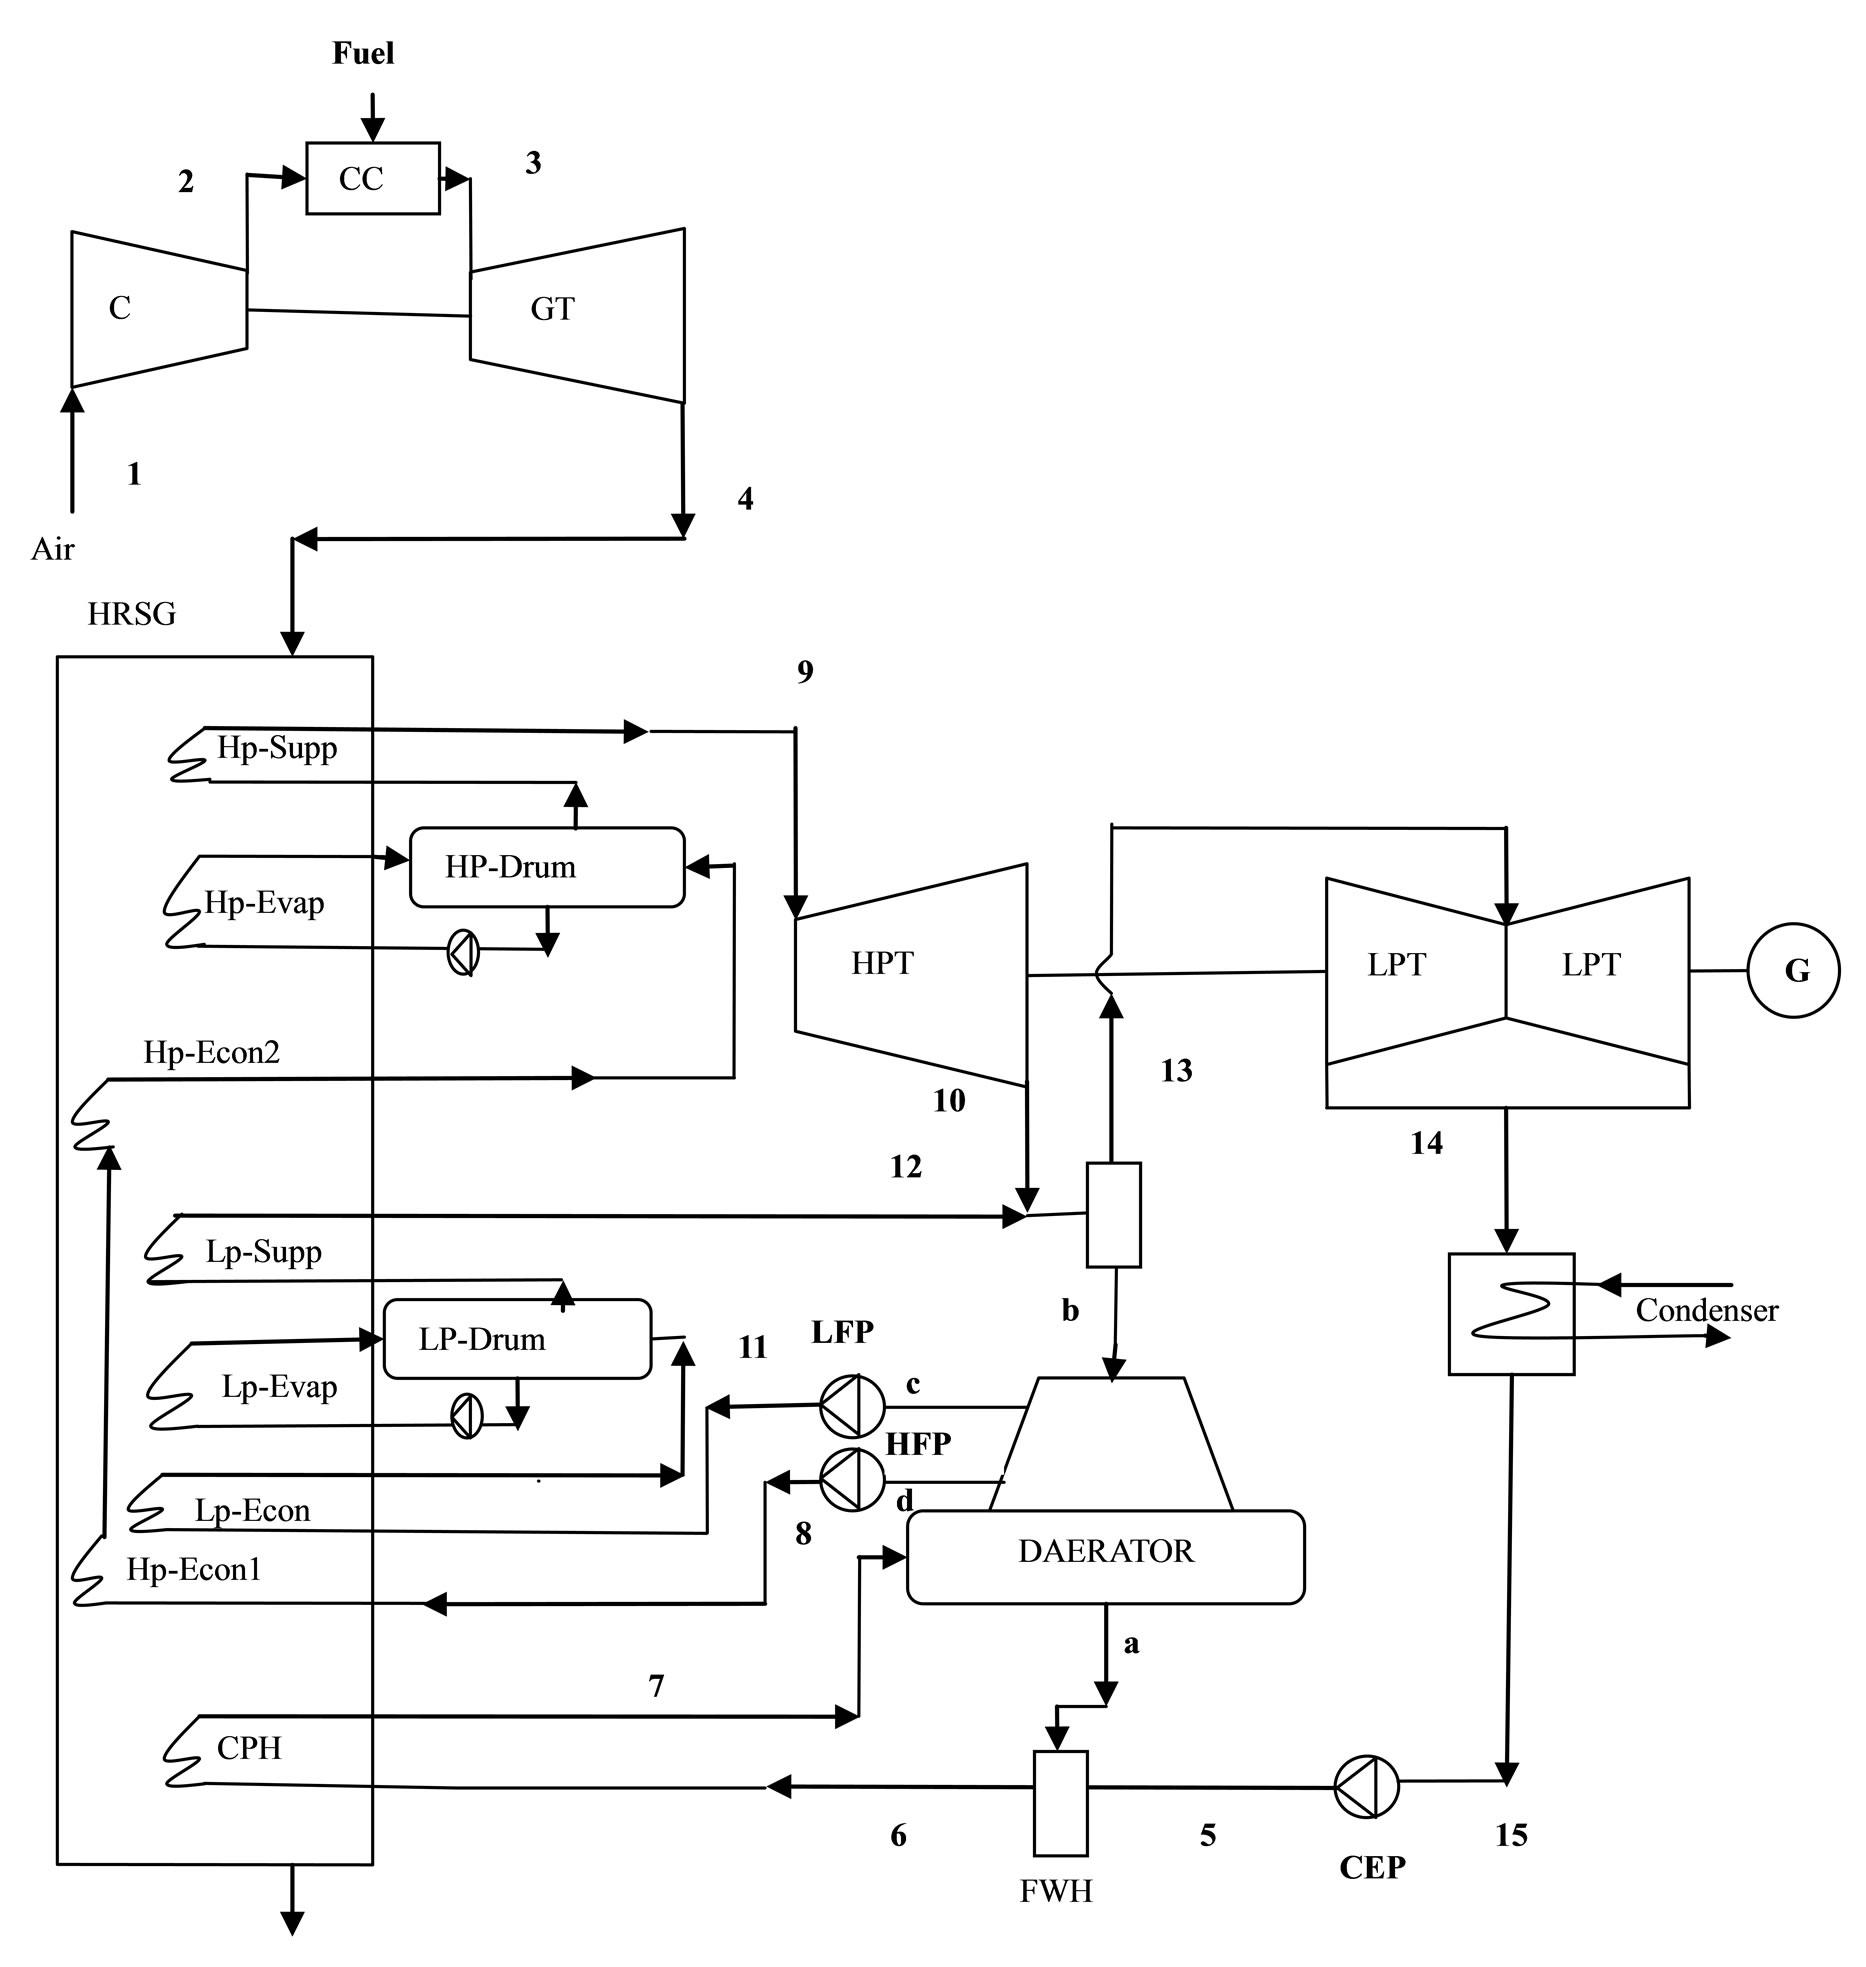 power plant line diagram line diagram of thermal power plant indicating each and ... thermal power plant line diagram